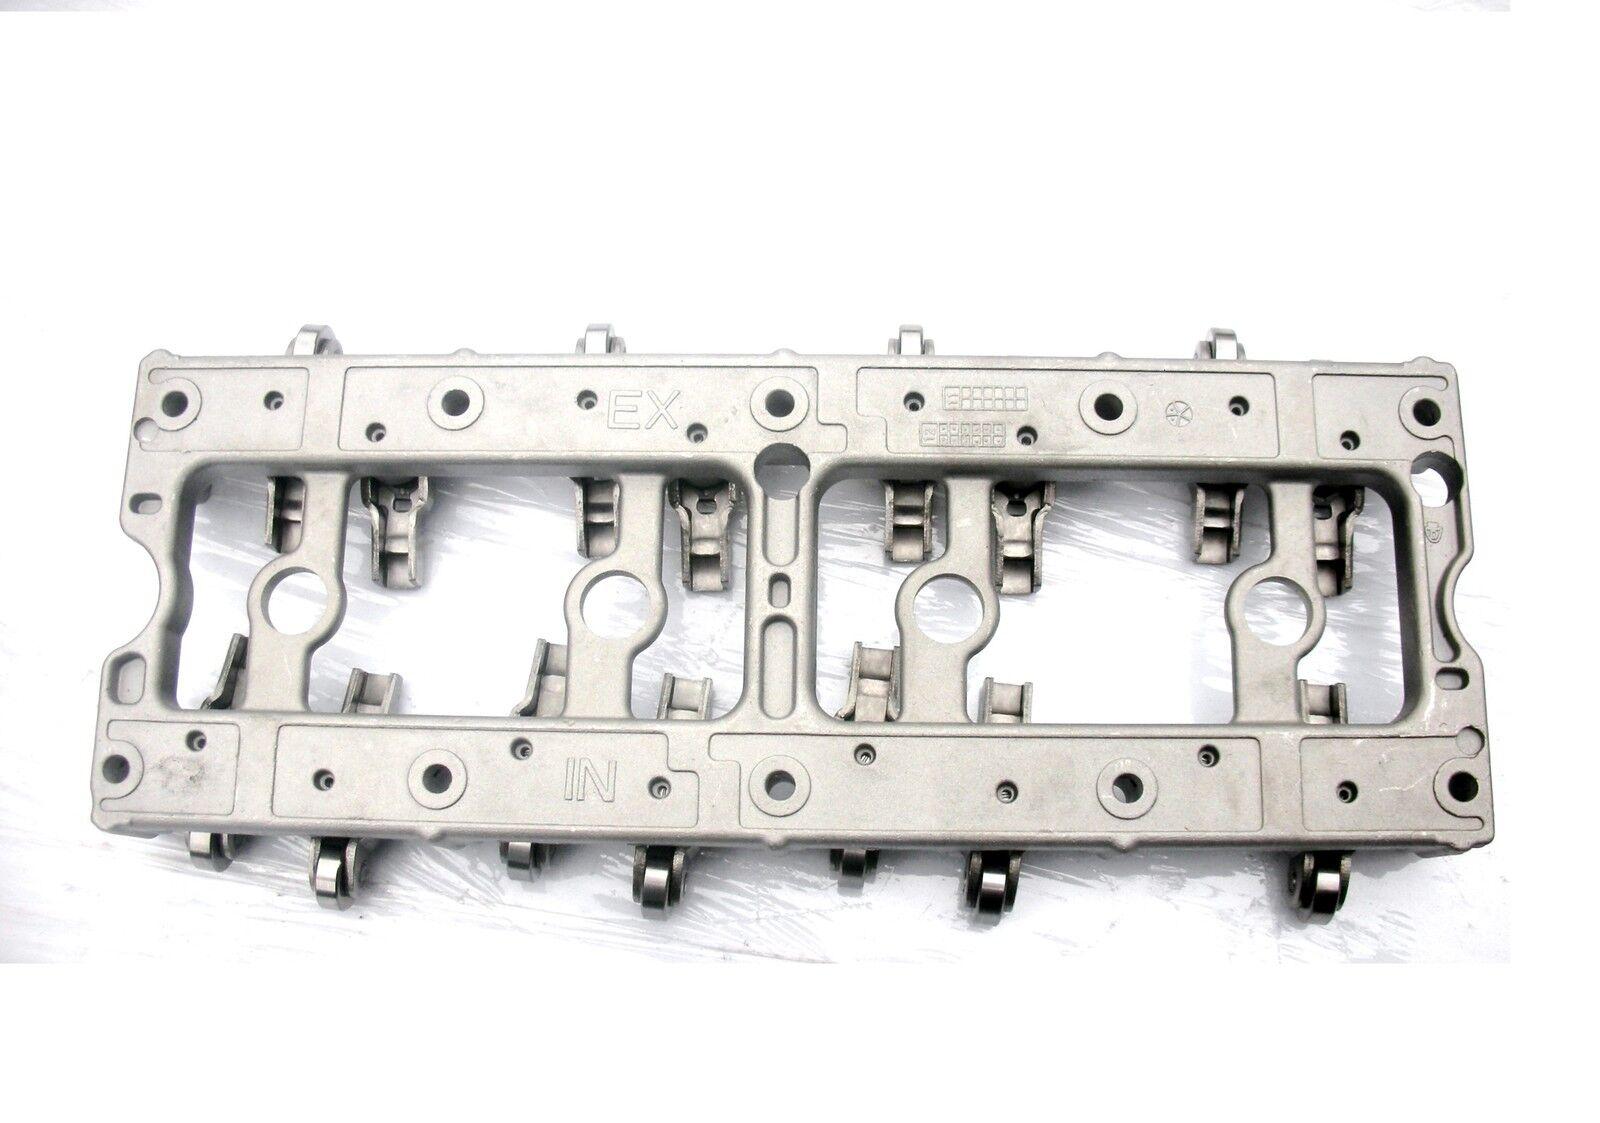 BRAND NEW FORD TRANSIT 2.4 ROCKER ARM FOLLOWER CARRIER LADDER MK7 TDCI 06 ON